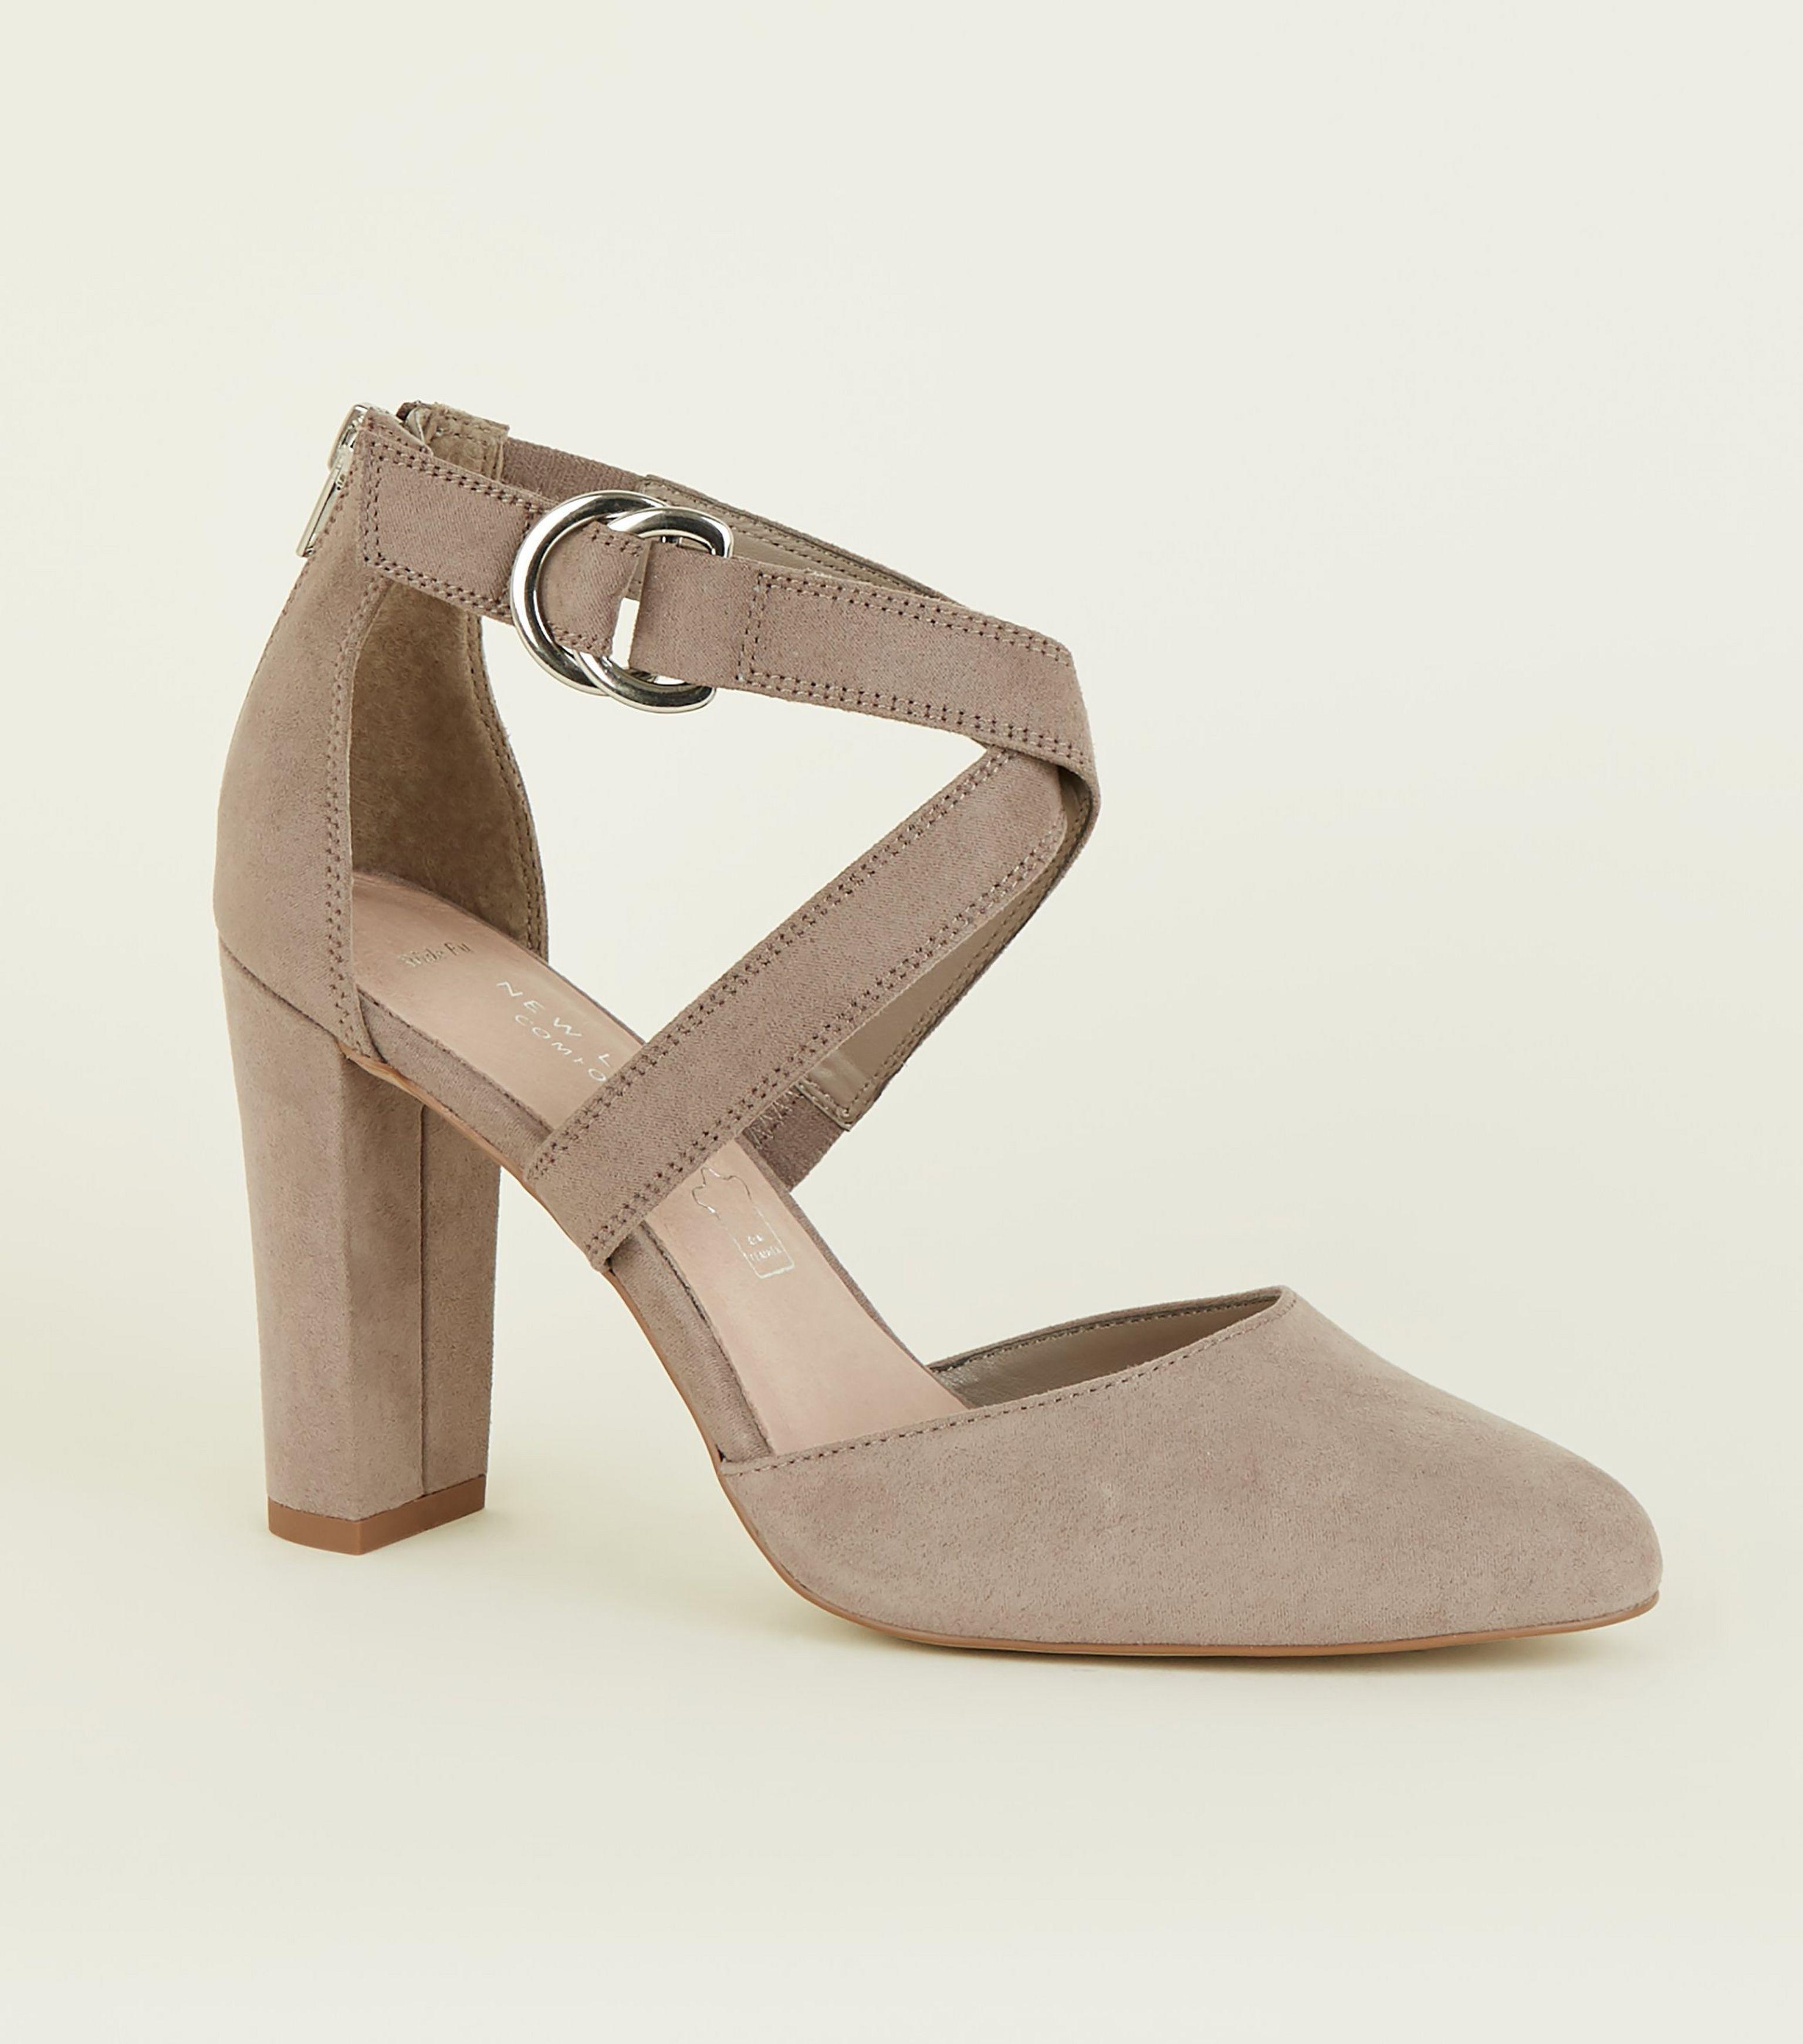 75674b4ea8 New Look Wide Fit Black Comfort Fit Suedette D-ring Detail Heels in ...